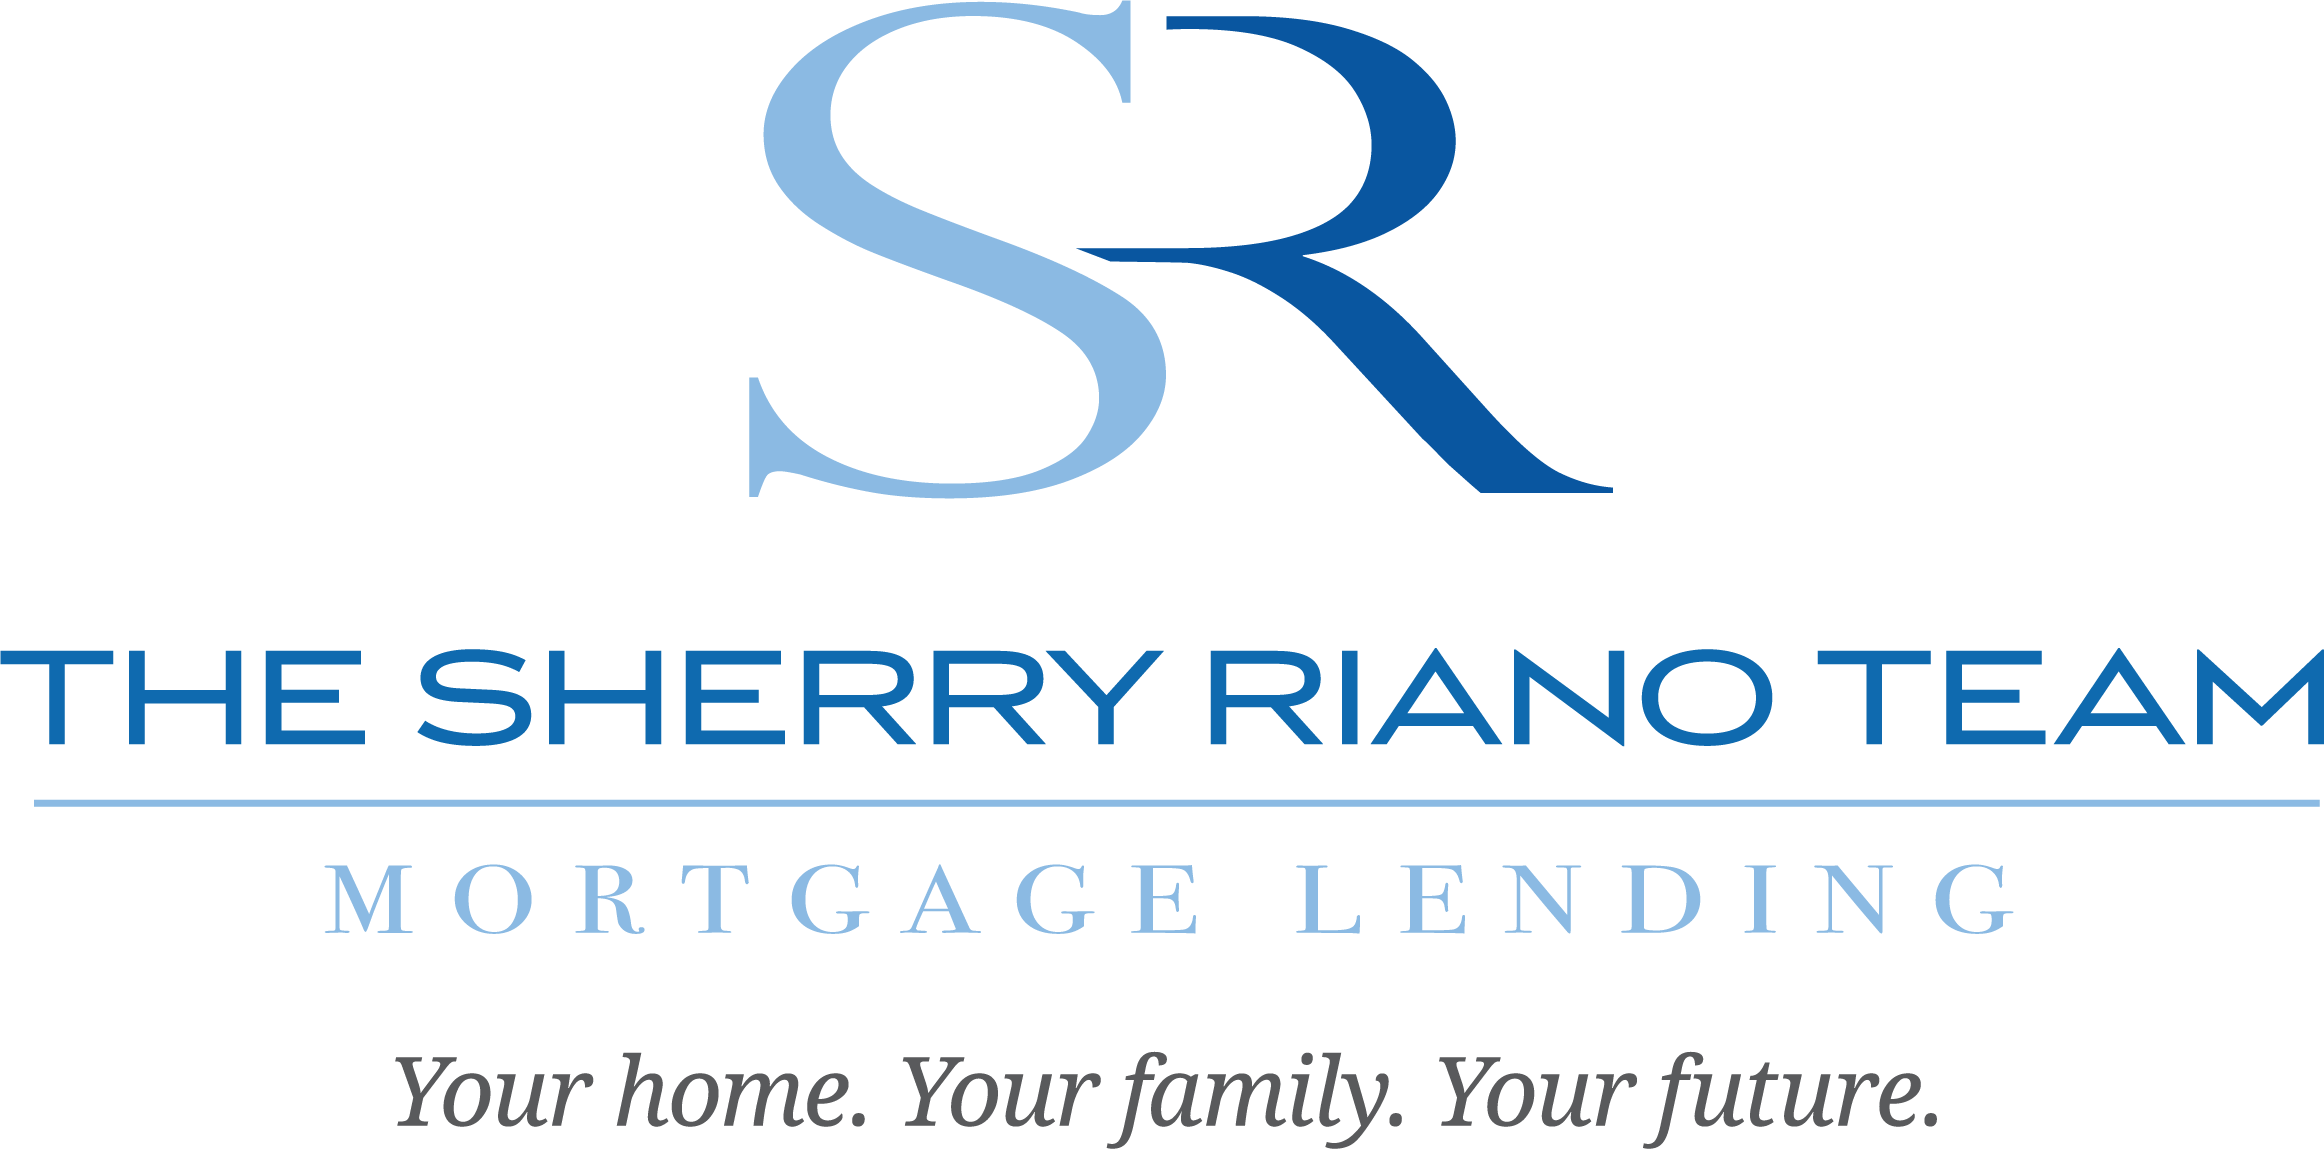 The Sherry Riano Team logo